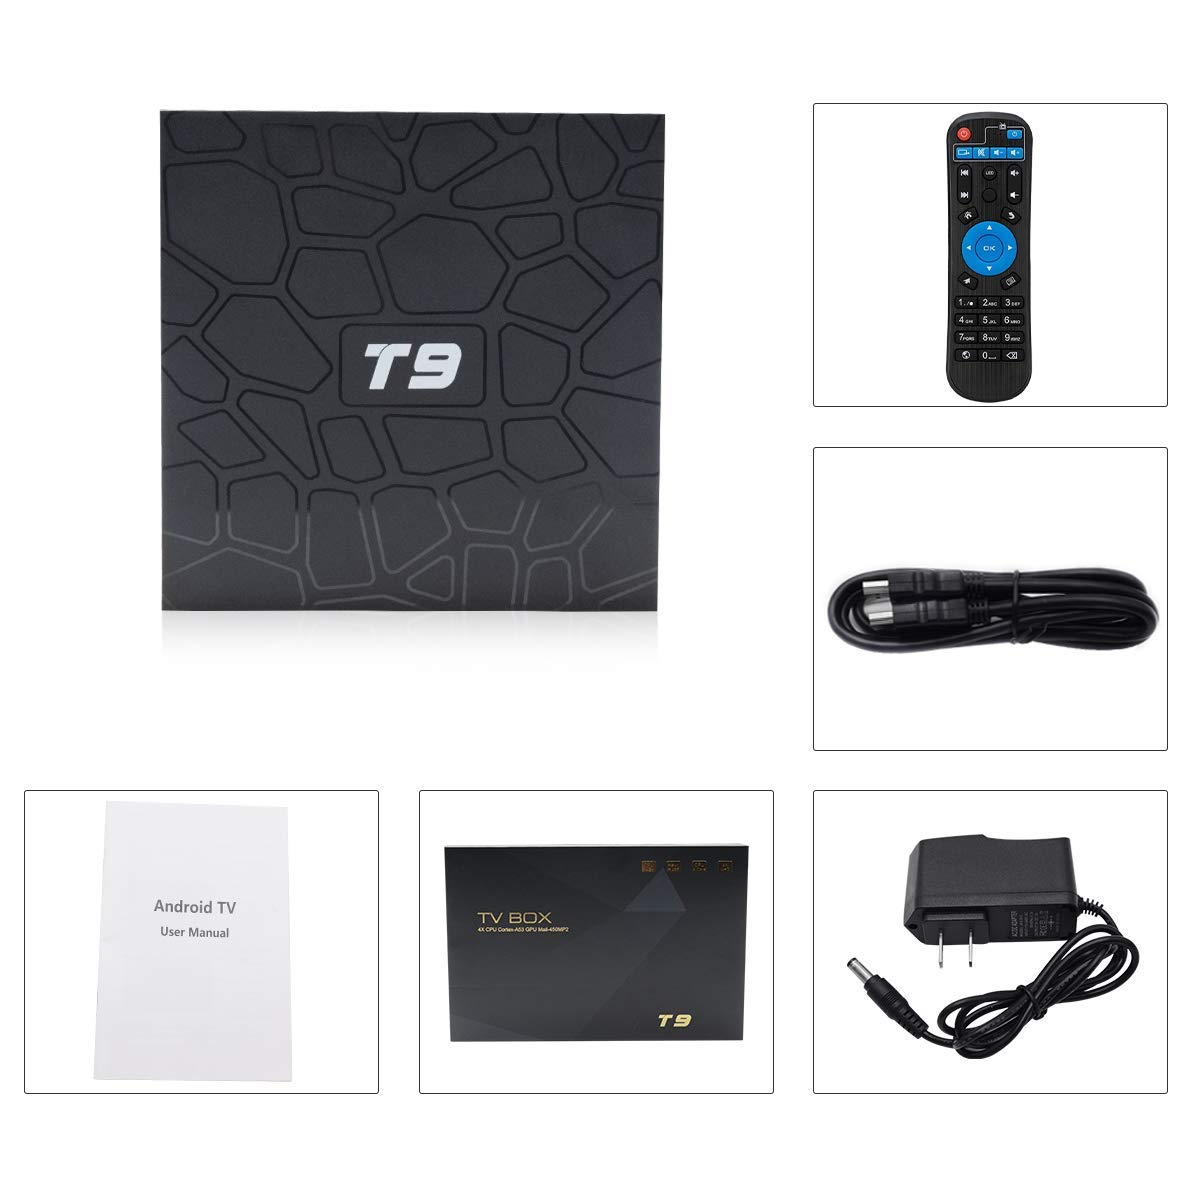 2018 T9 tv box android 8.1 WIFI 4 gb 64 gb TV Box Bluetooth 4.0 RK3328 Quad Core 4g 32g Smart tv Set-Top box android 8.1 Boîte 5g - 6